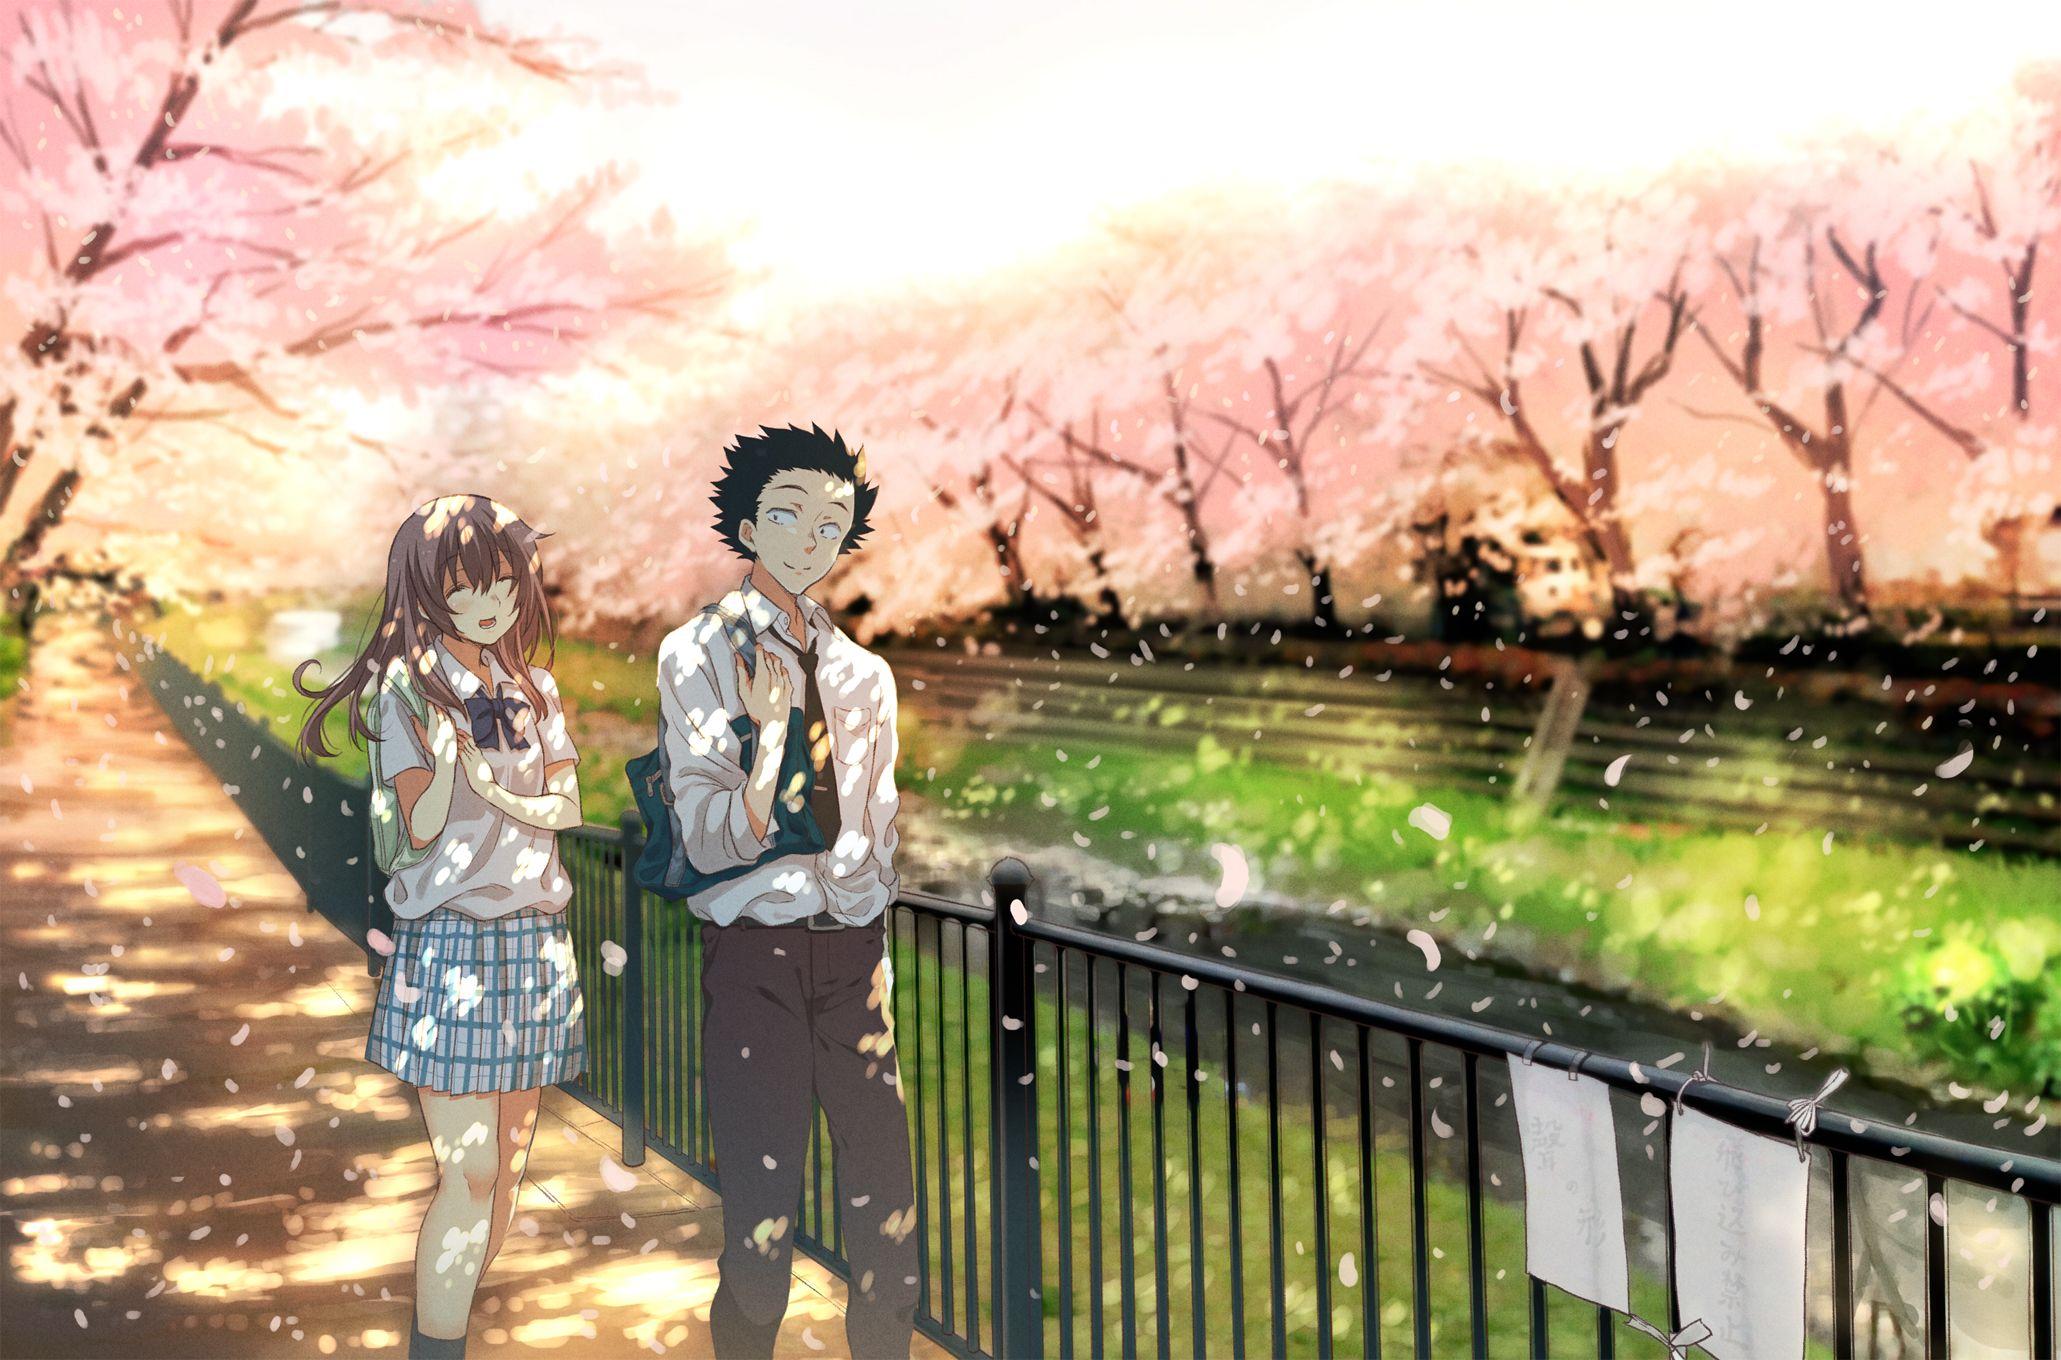 """Ishida Shouya"" ""Nishimiya Shouko"" 壁紙 イラスト, 壁紙, イラスト画像"